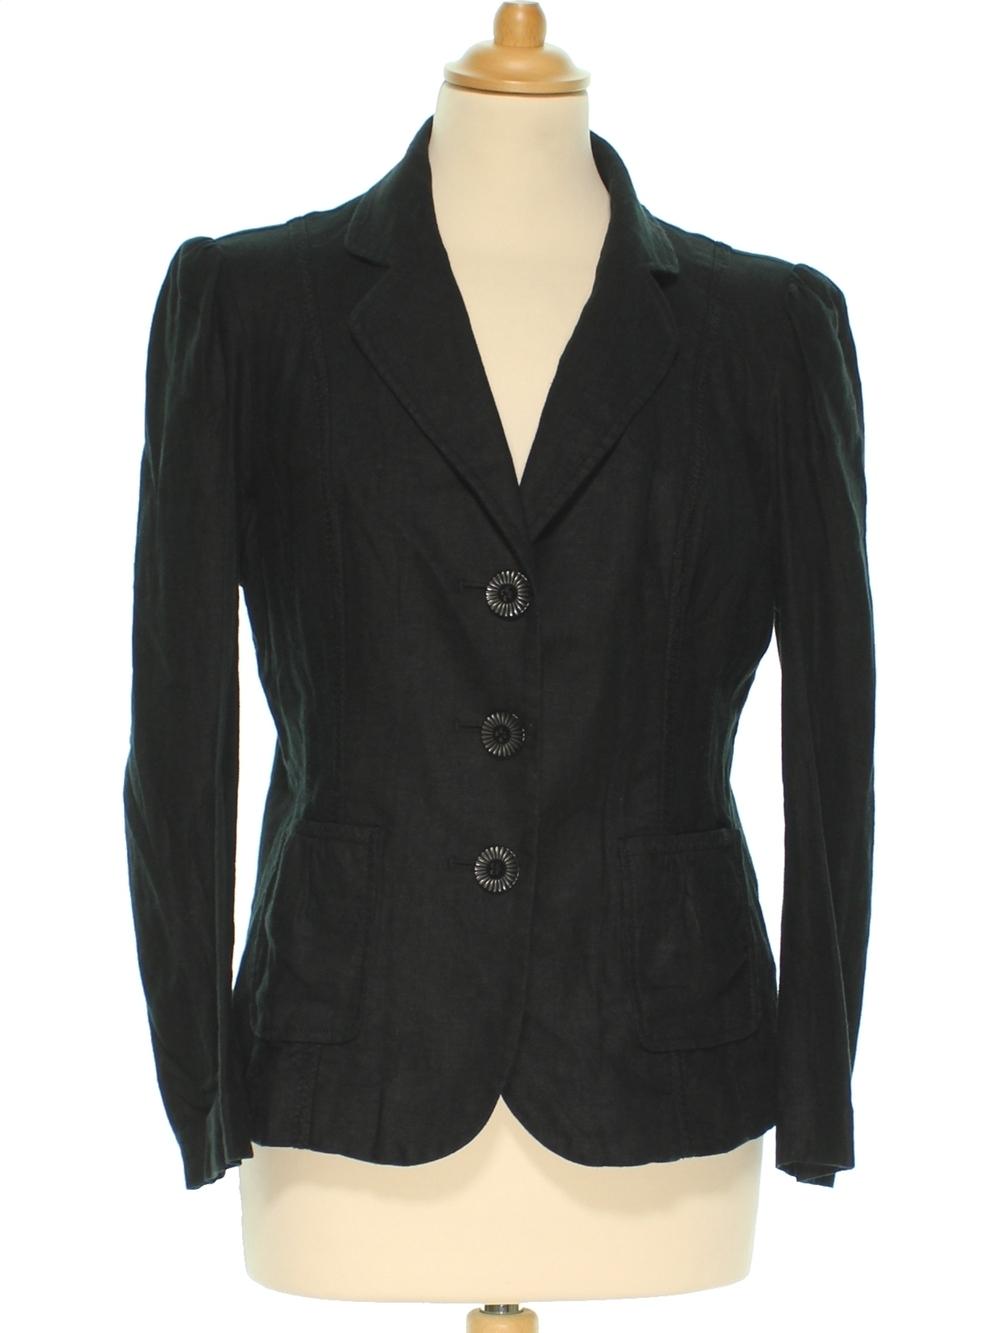 Veste de tailleur blazer